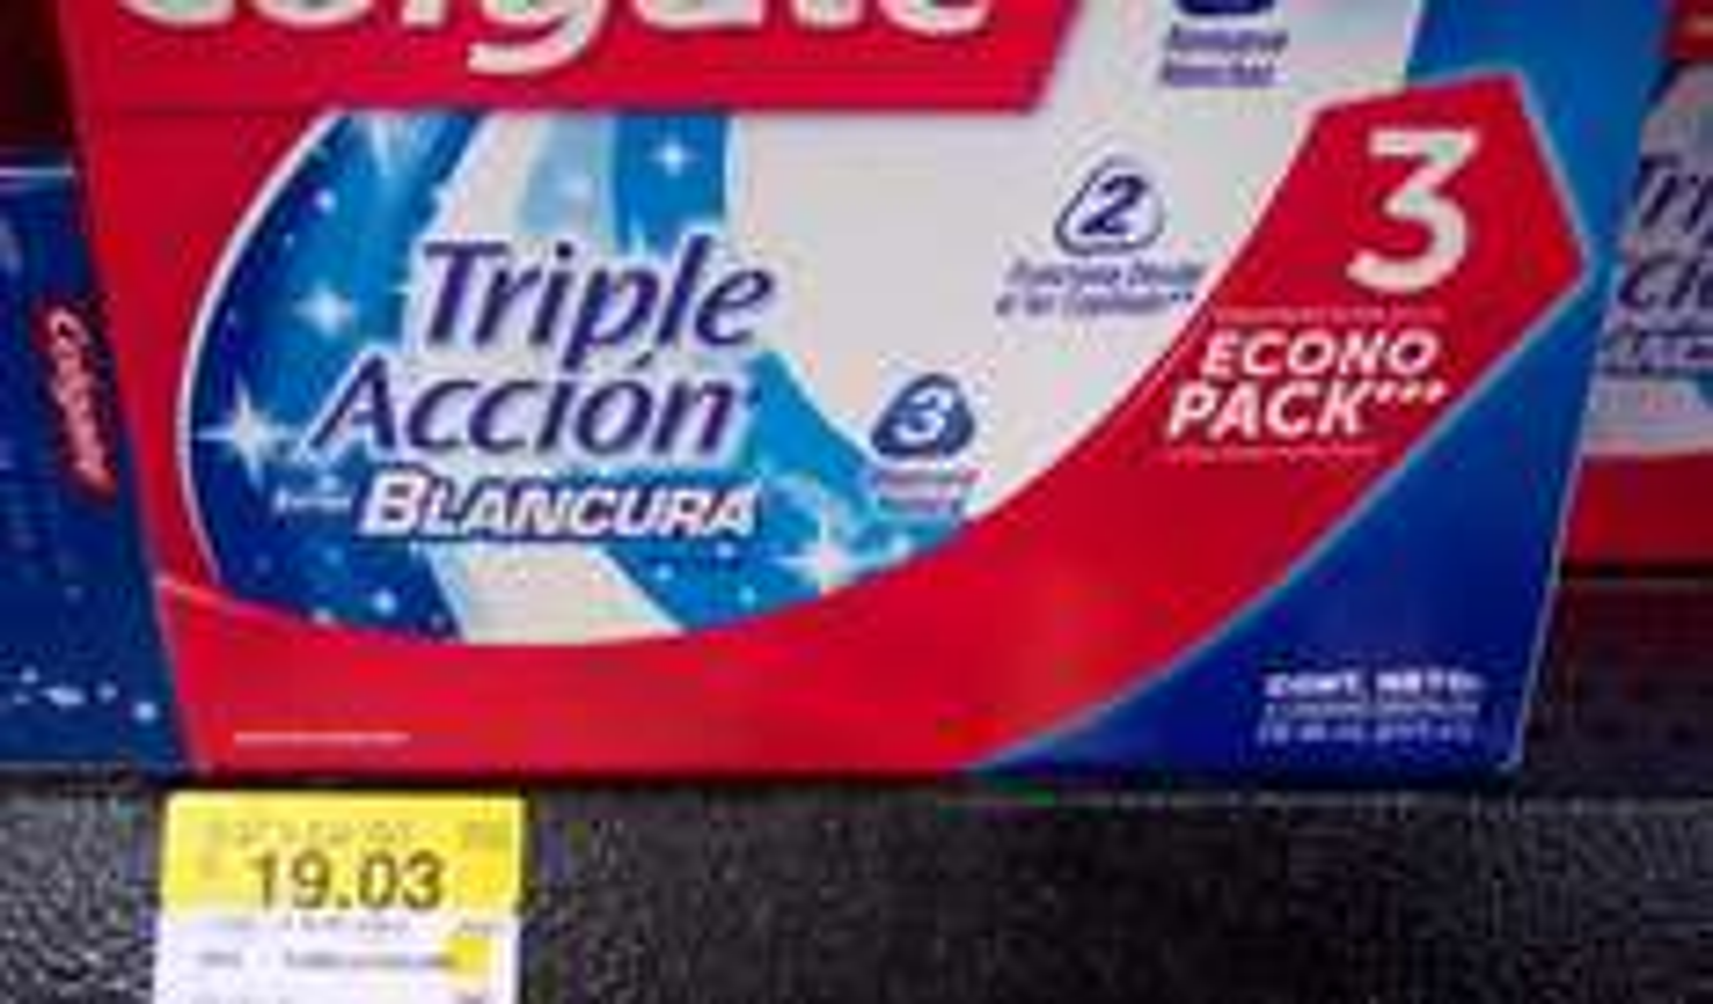 Walmart: 3 Colgate 90 ml. Triple Accion Extra Blancura a $19.03